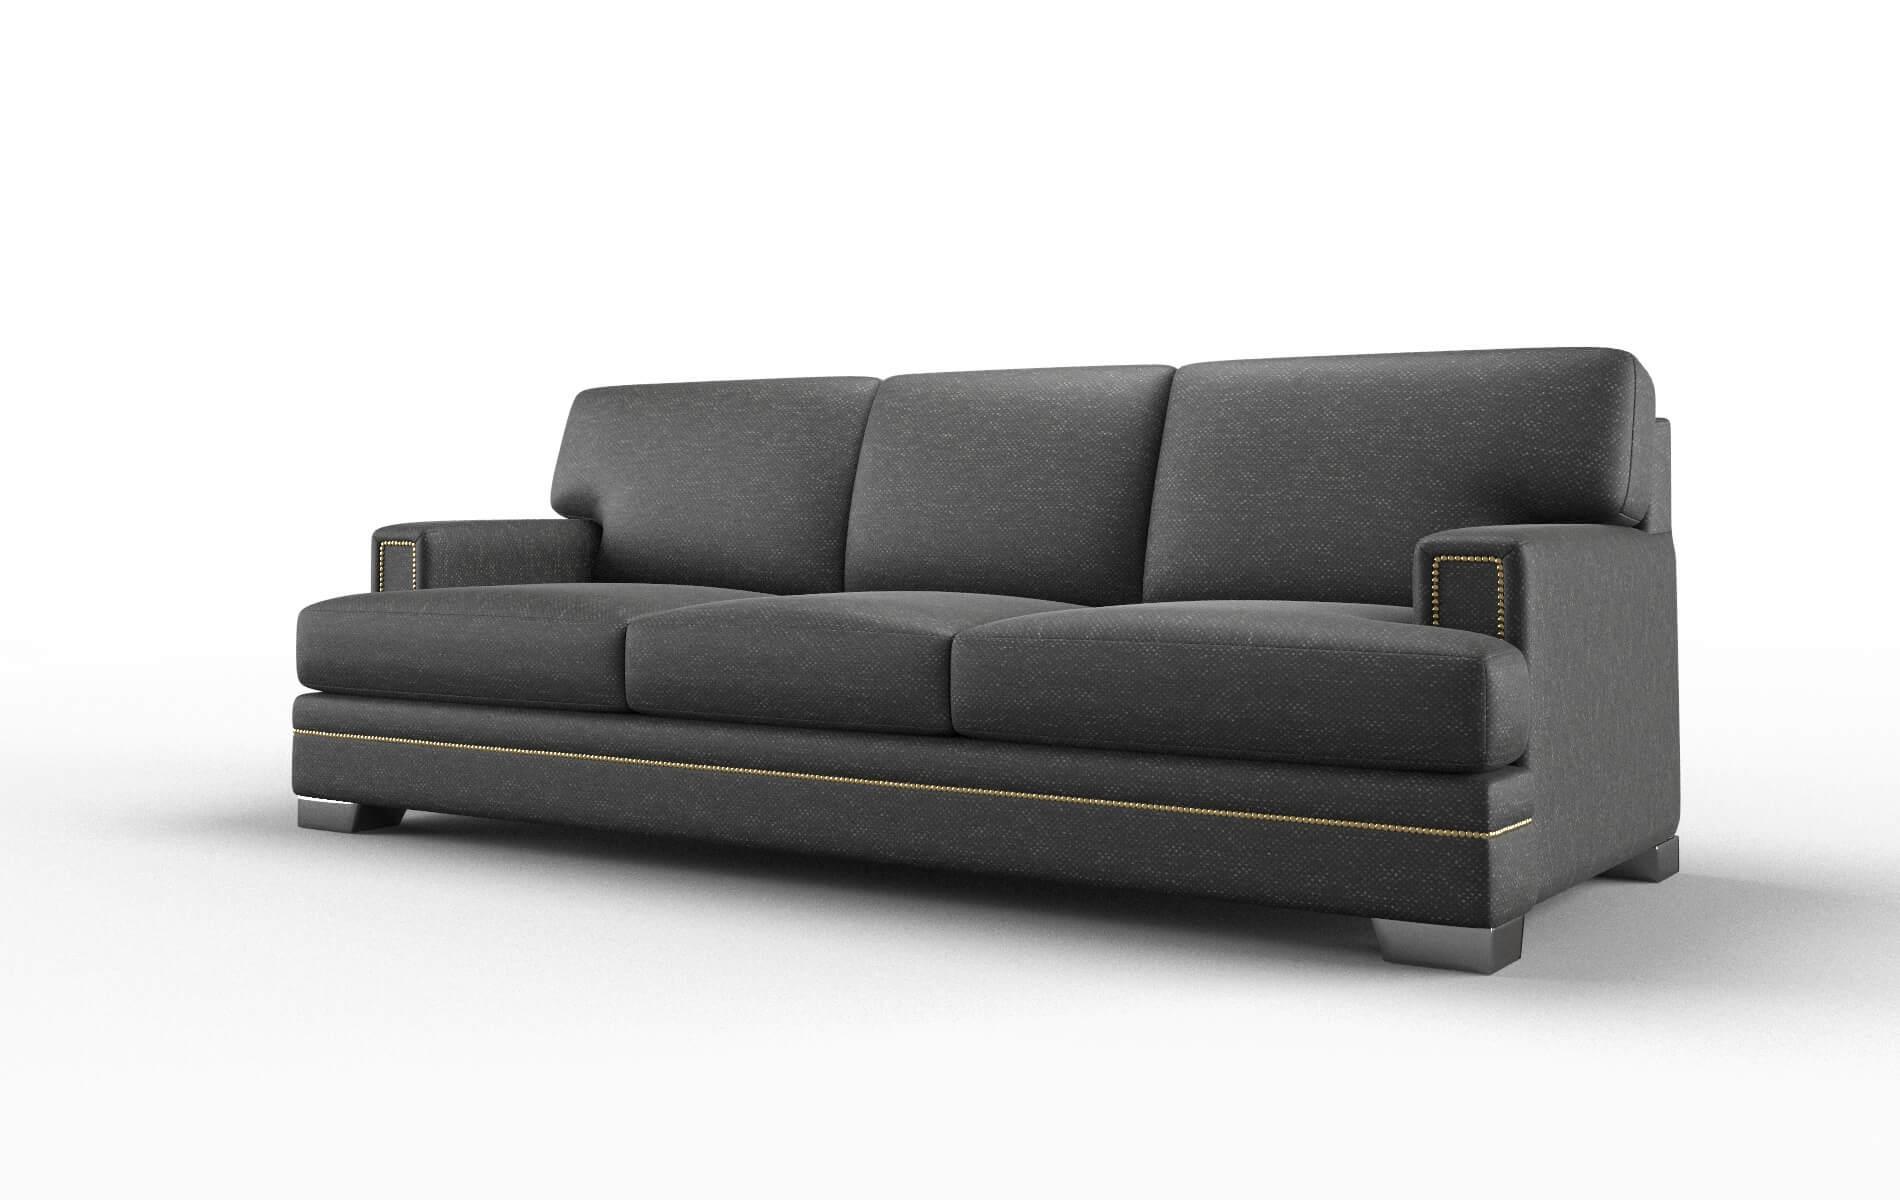 Surprising Barcelona Phoenix Charcoal Sofa Evergreenethics Interior Chair Design Evergreenethicsorg